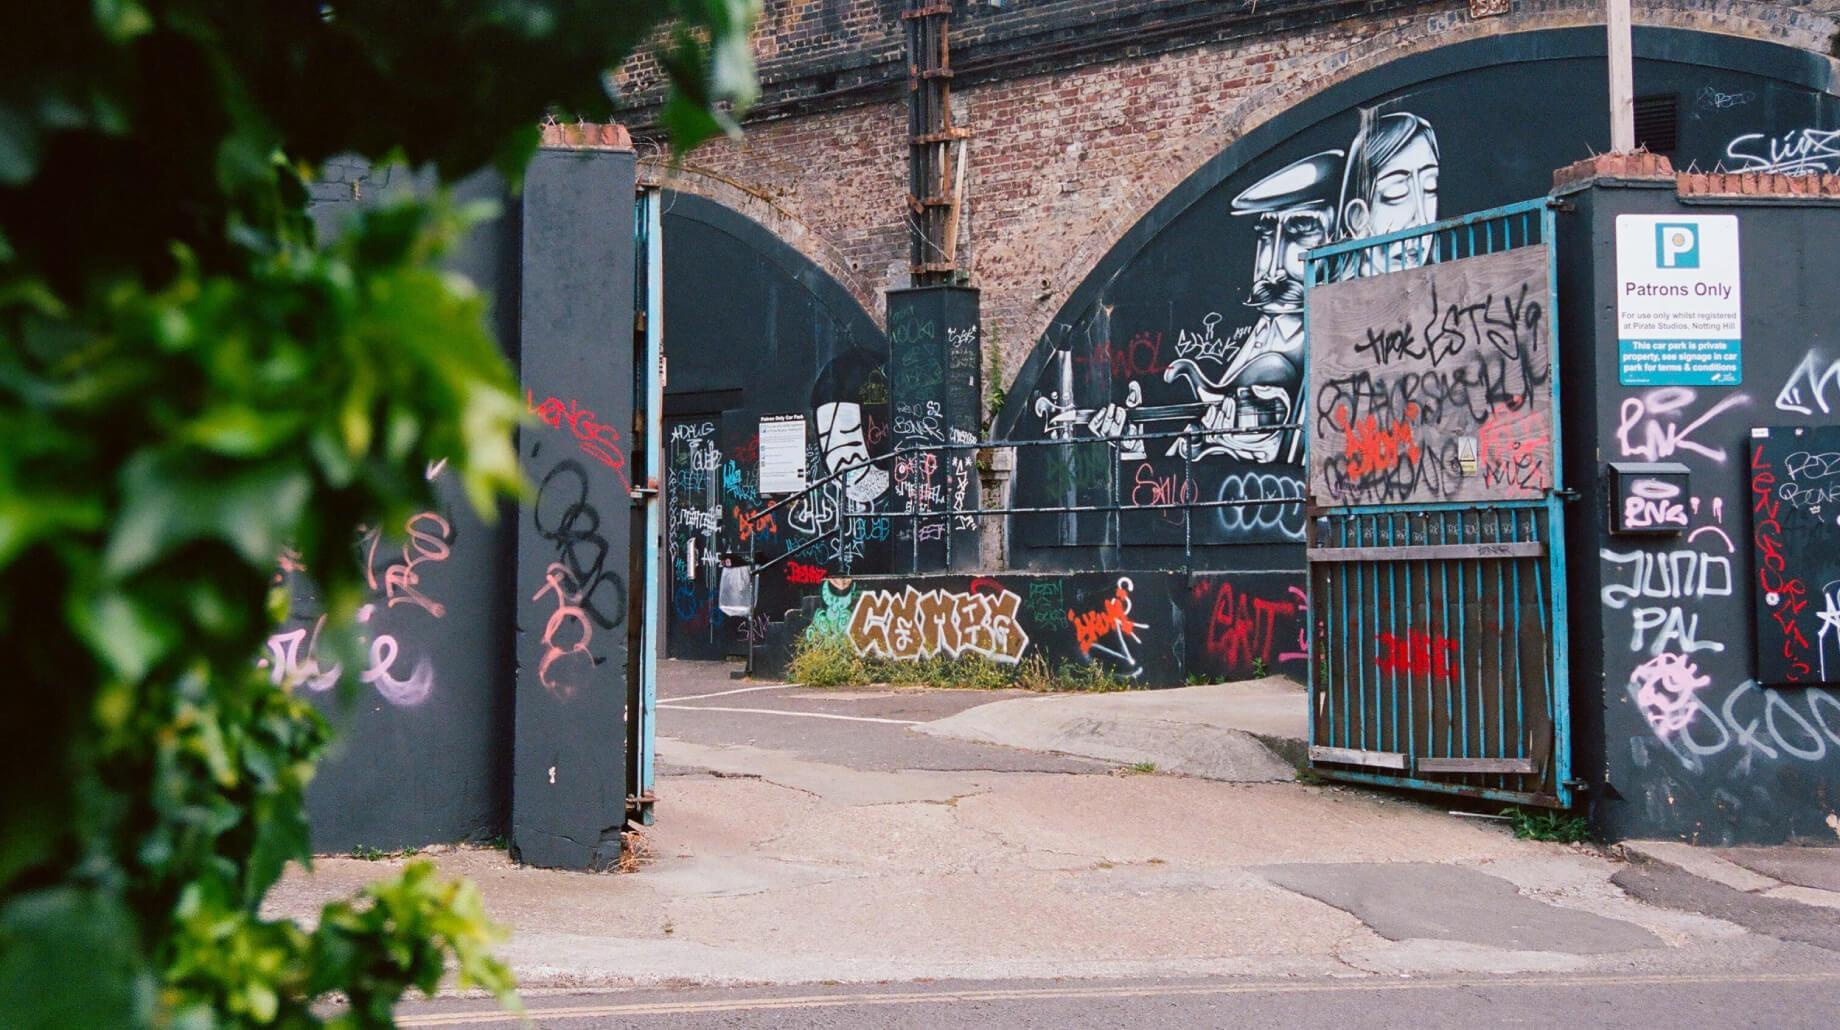 This image may contain: graffiti, art, mural, painting